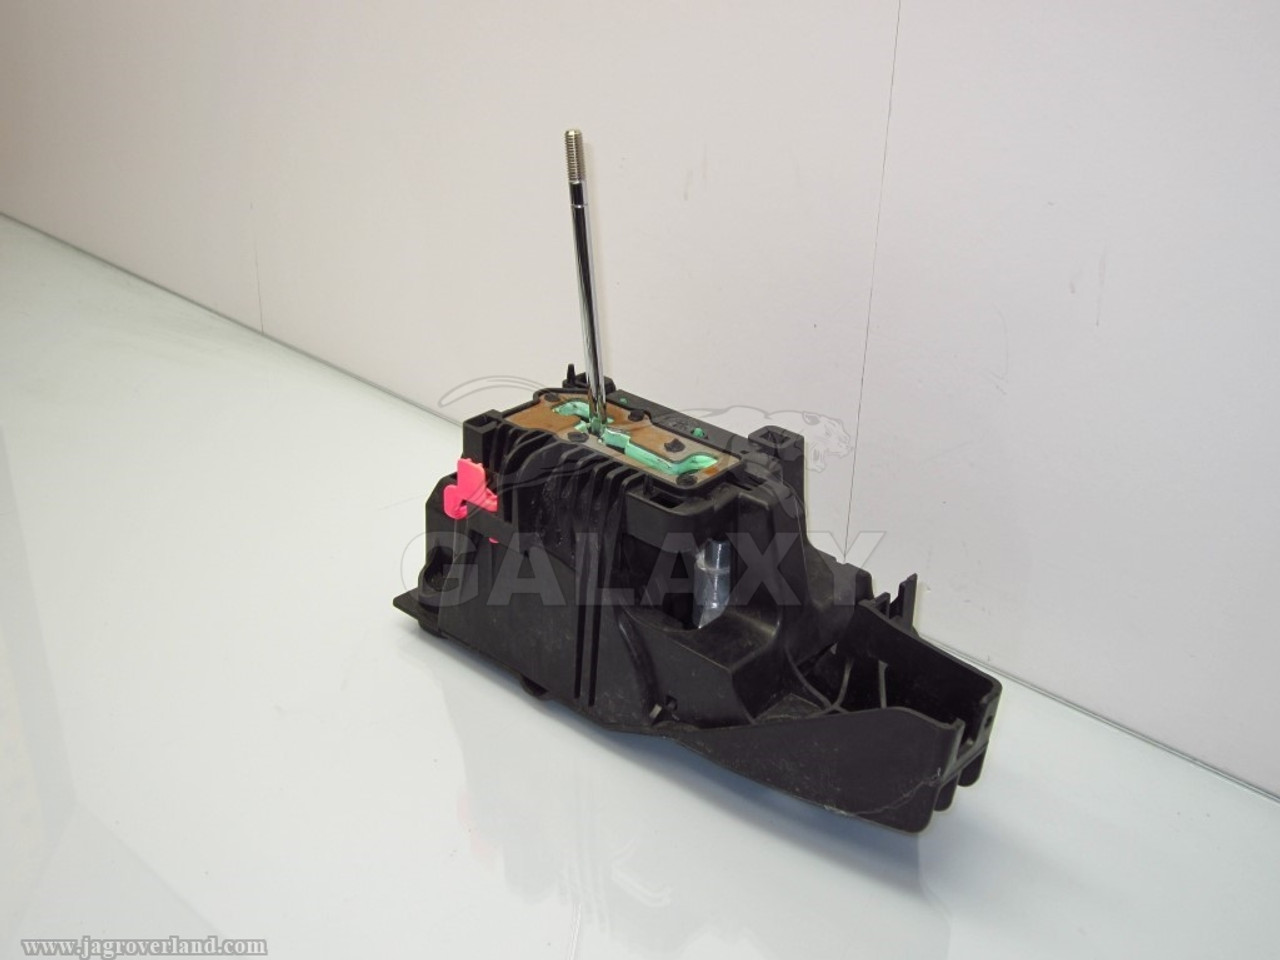 2005-2007 Dodge Charger Rt Floor Shifter Gear Selector Indicator Module  68091341Aa